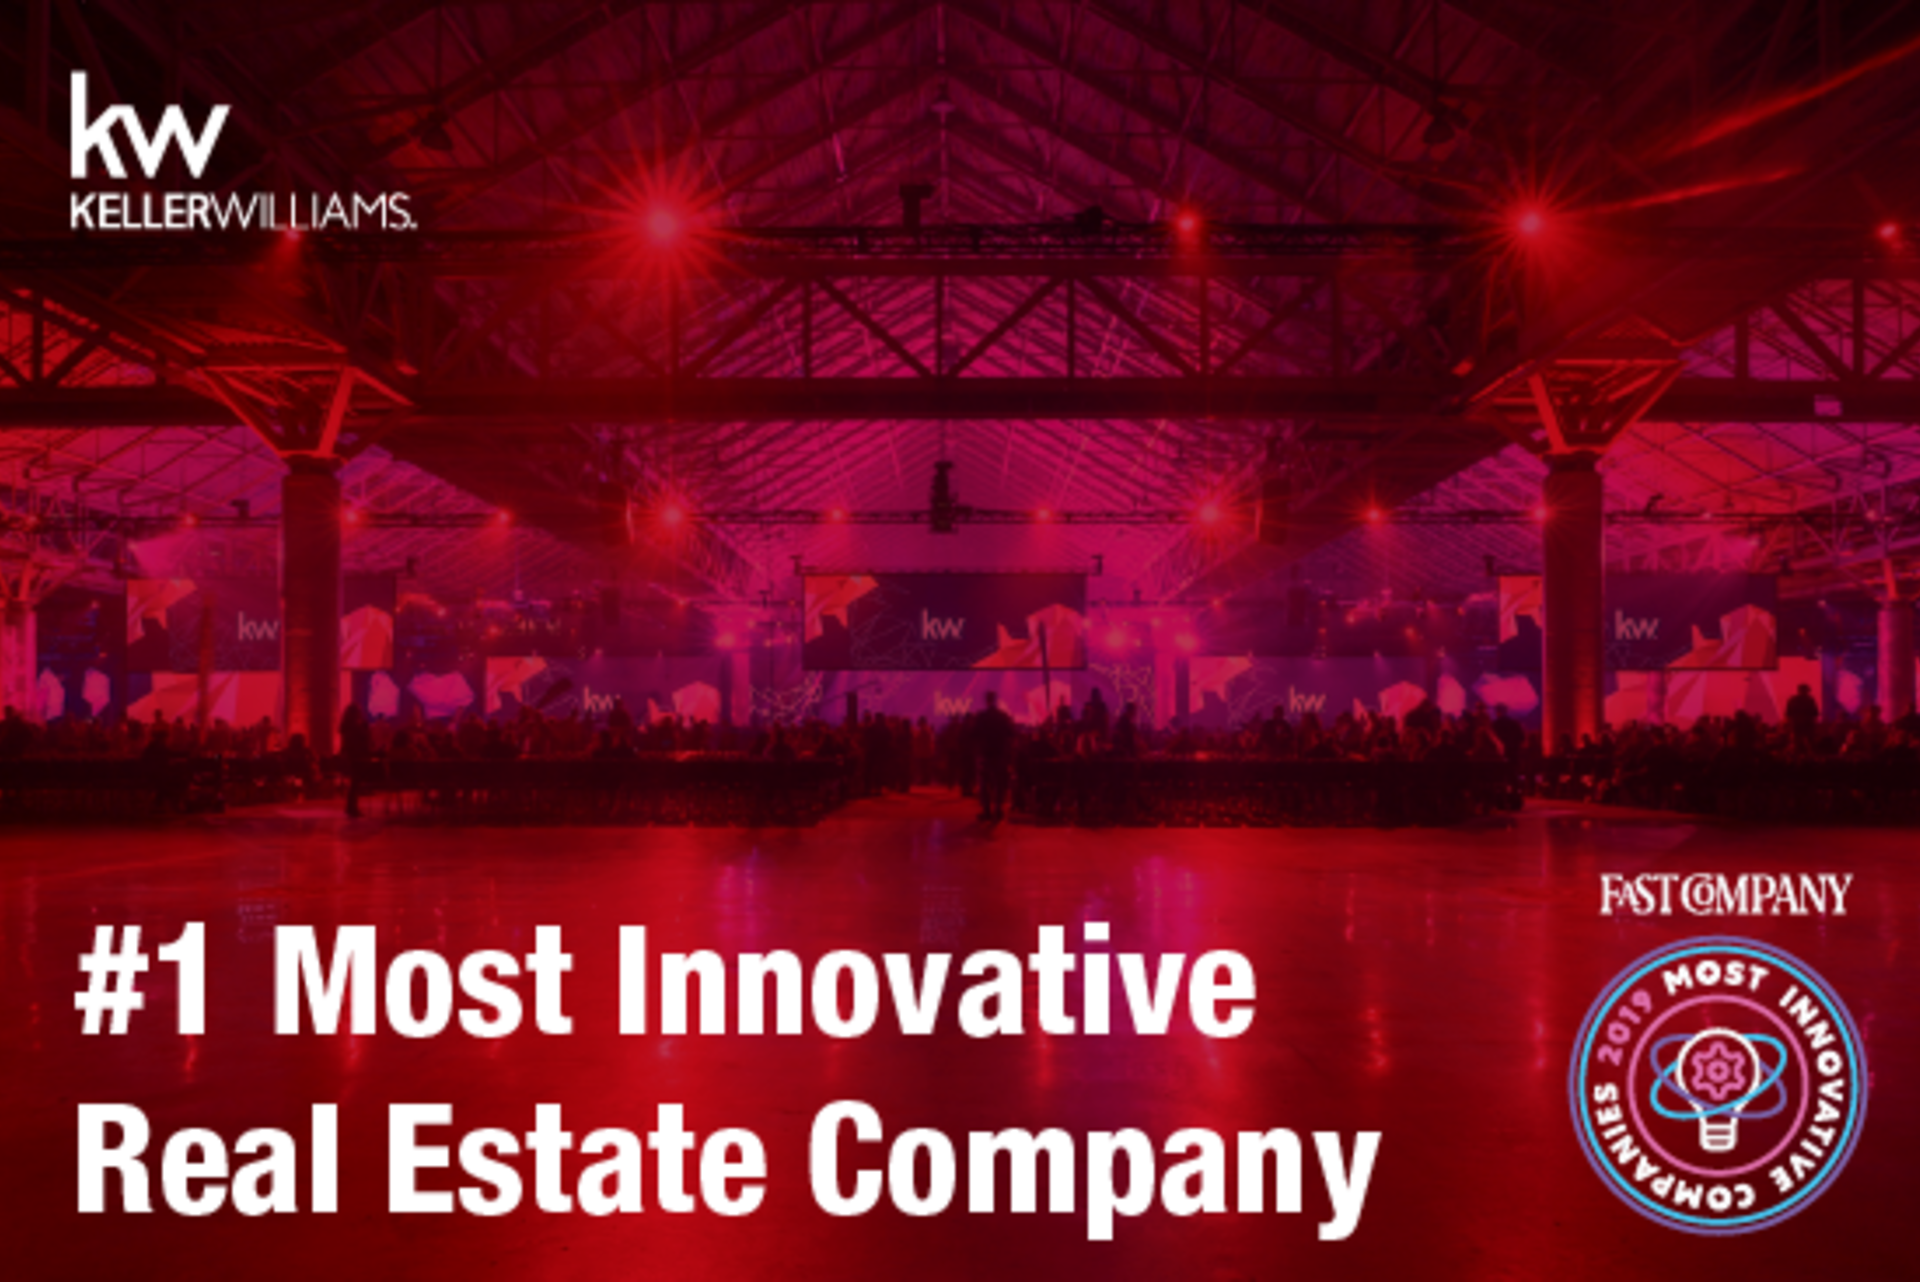 Keller Williams- #1 World's Most Innovative Company Feb 2019